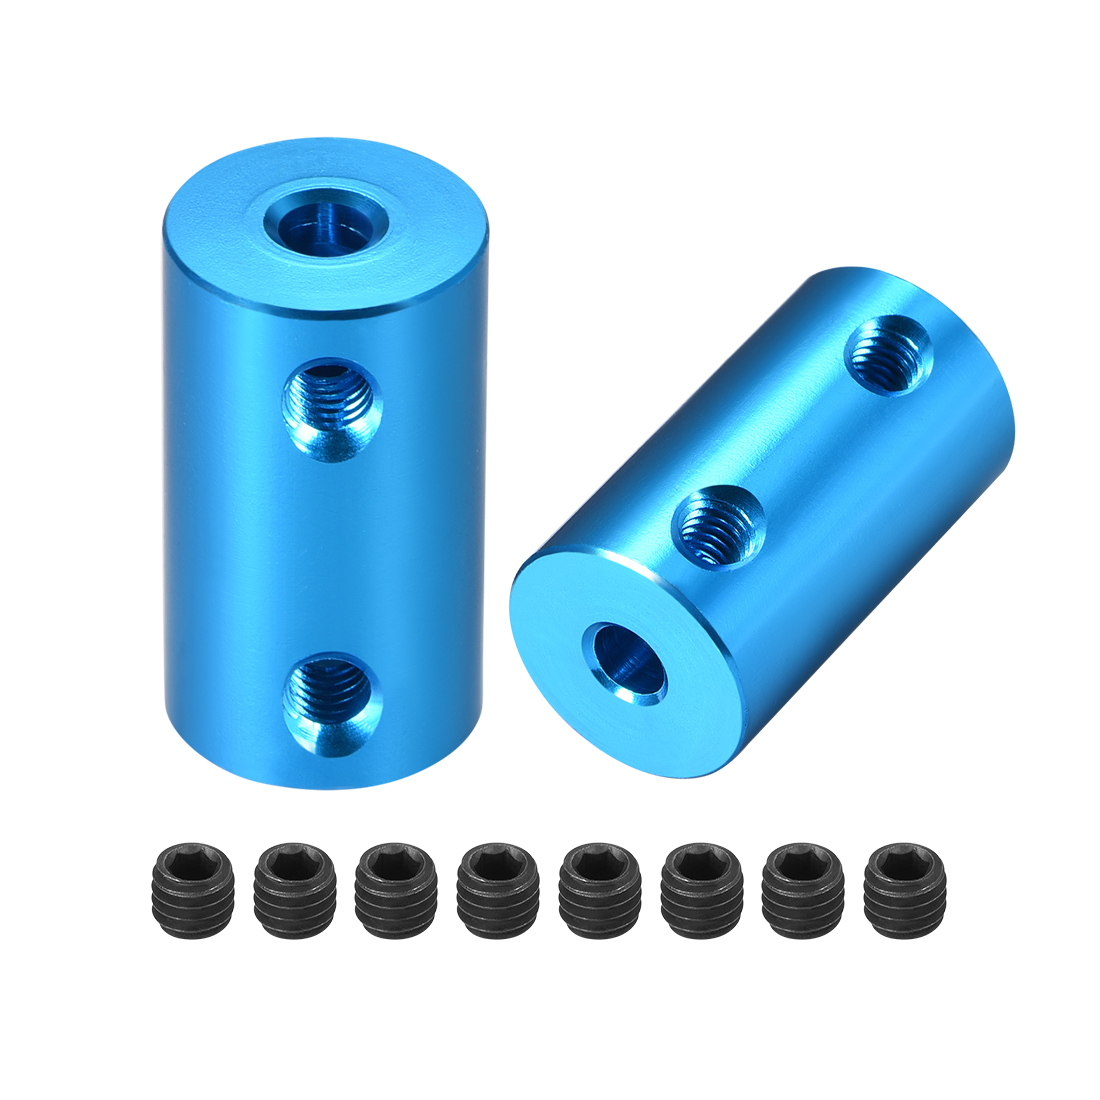 Shaft Coupling 4mm to 4mm L25xD14 Rigid Stepper Motor Wheel Coupler Blue 2 Pcs